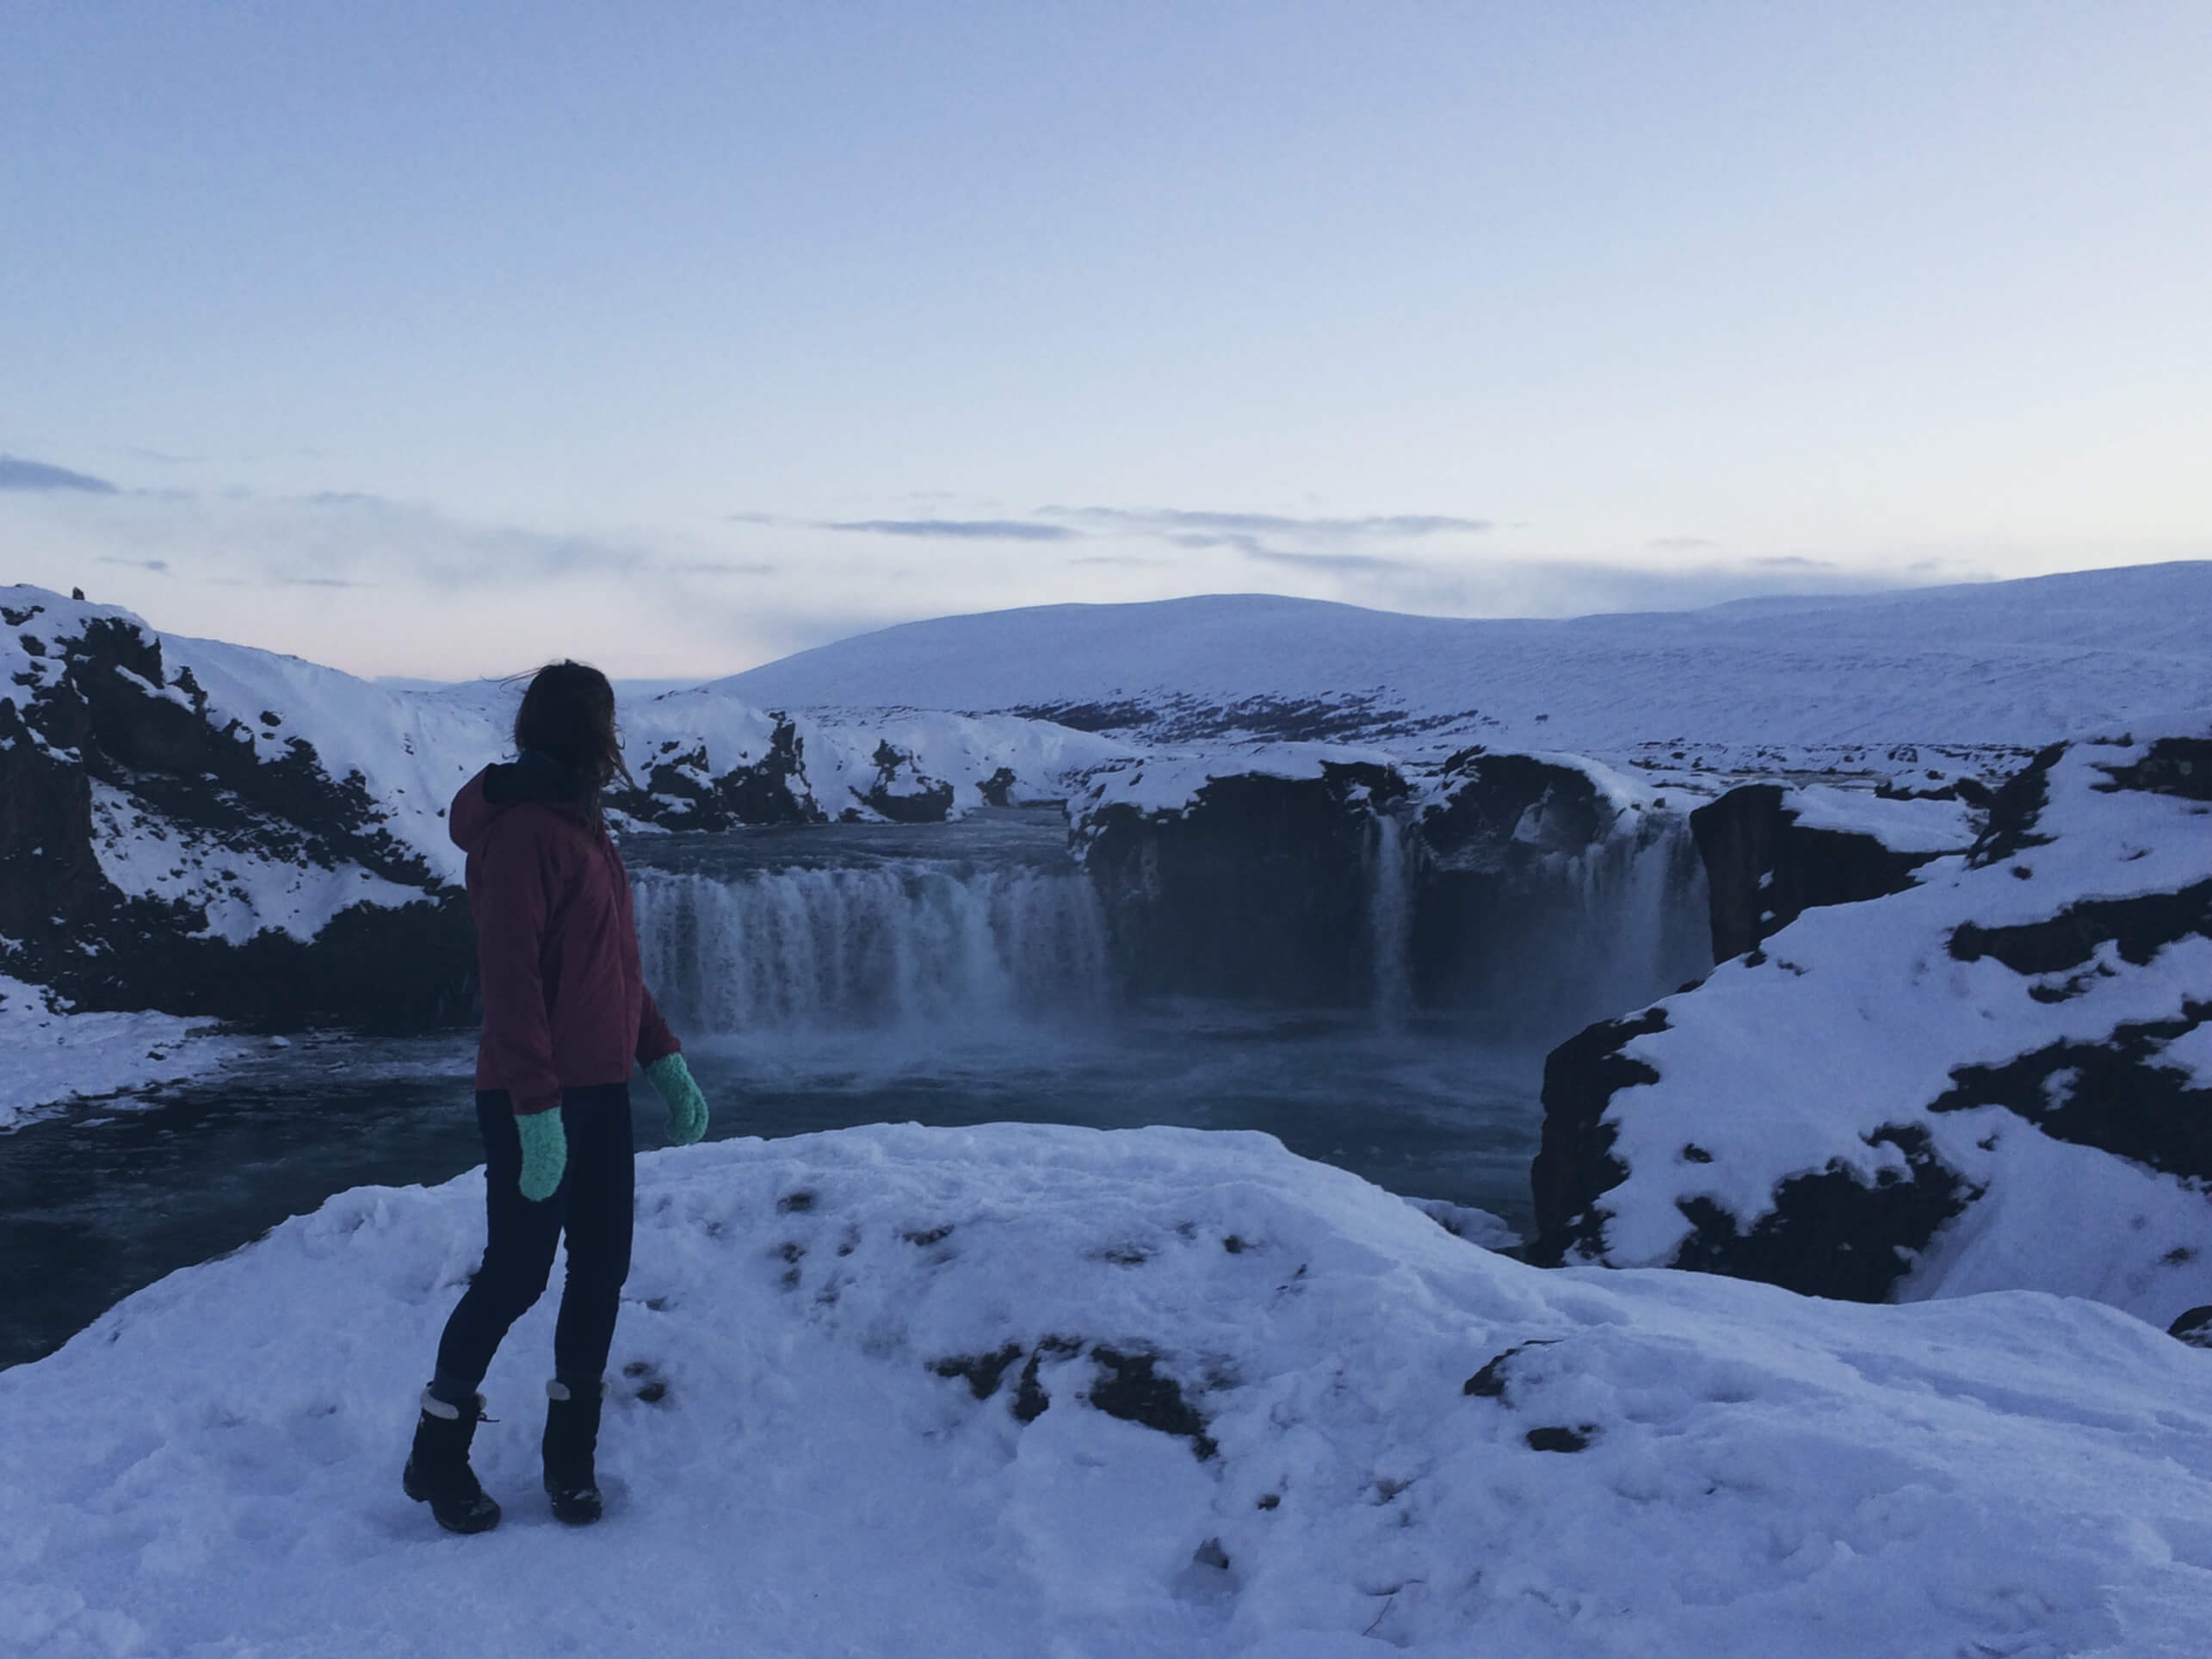 Travel Iceland - Akureyri, Godafoss Waterfall, North